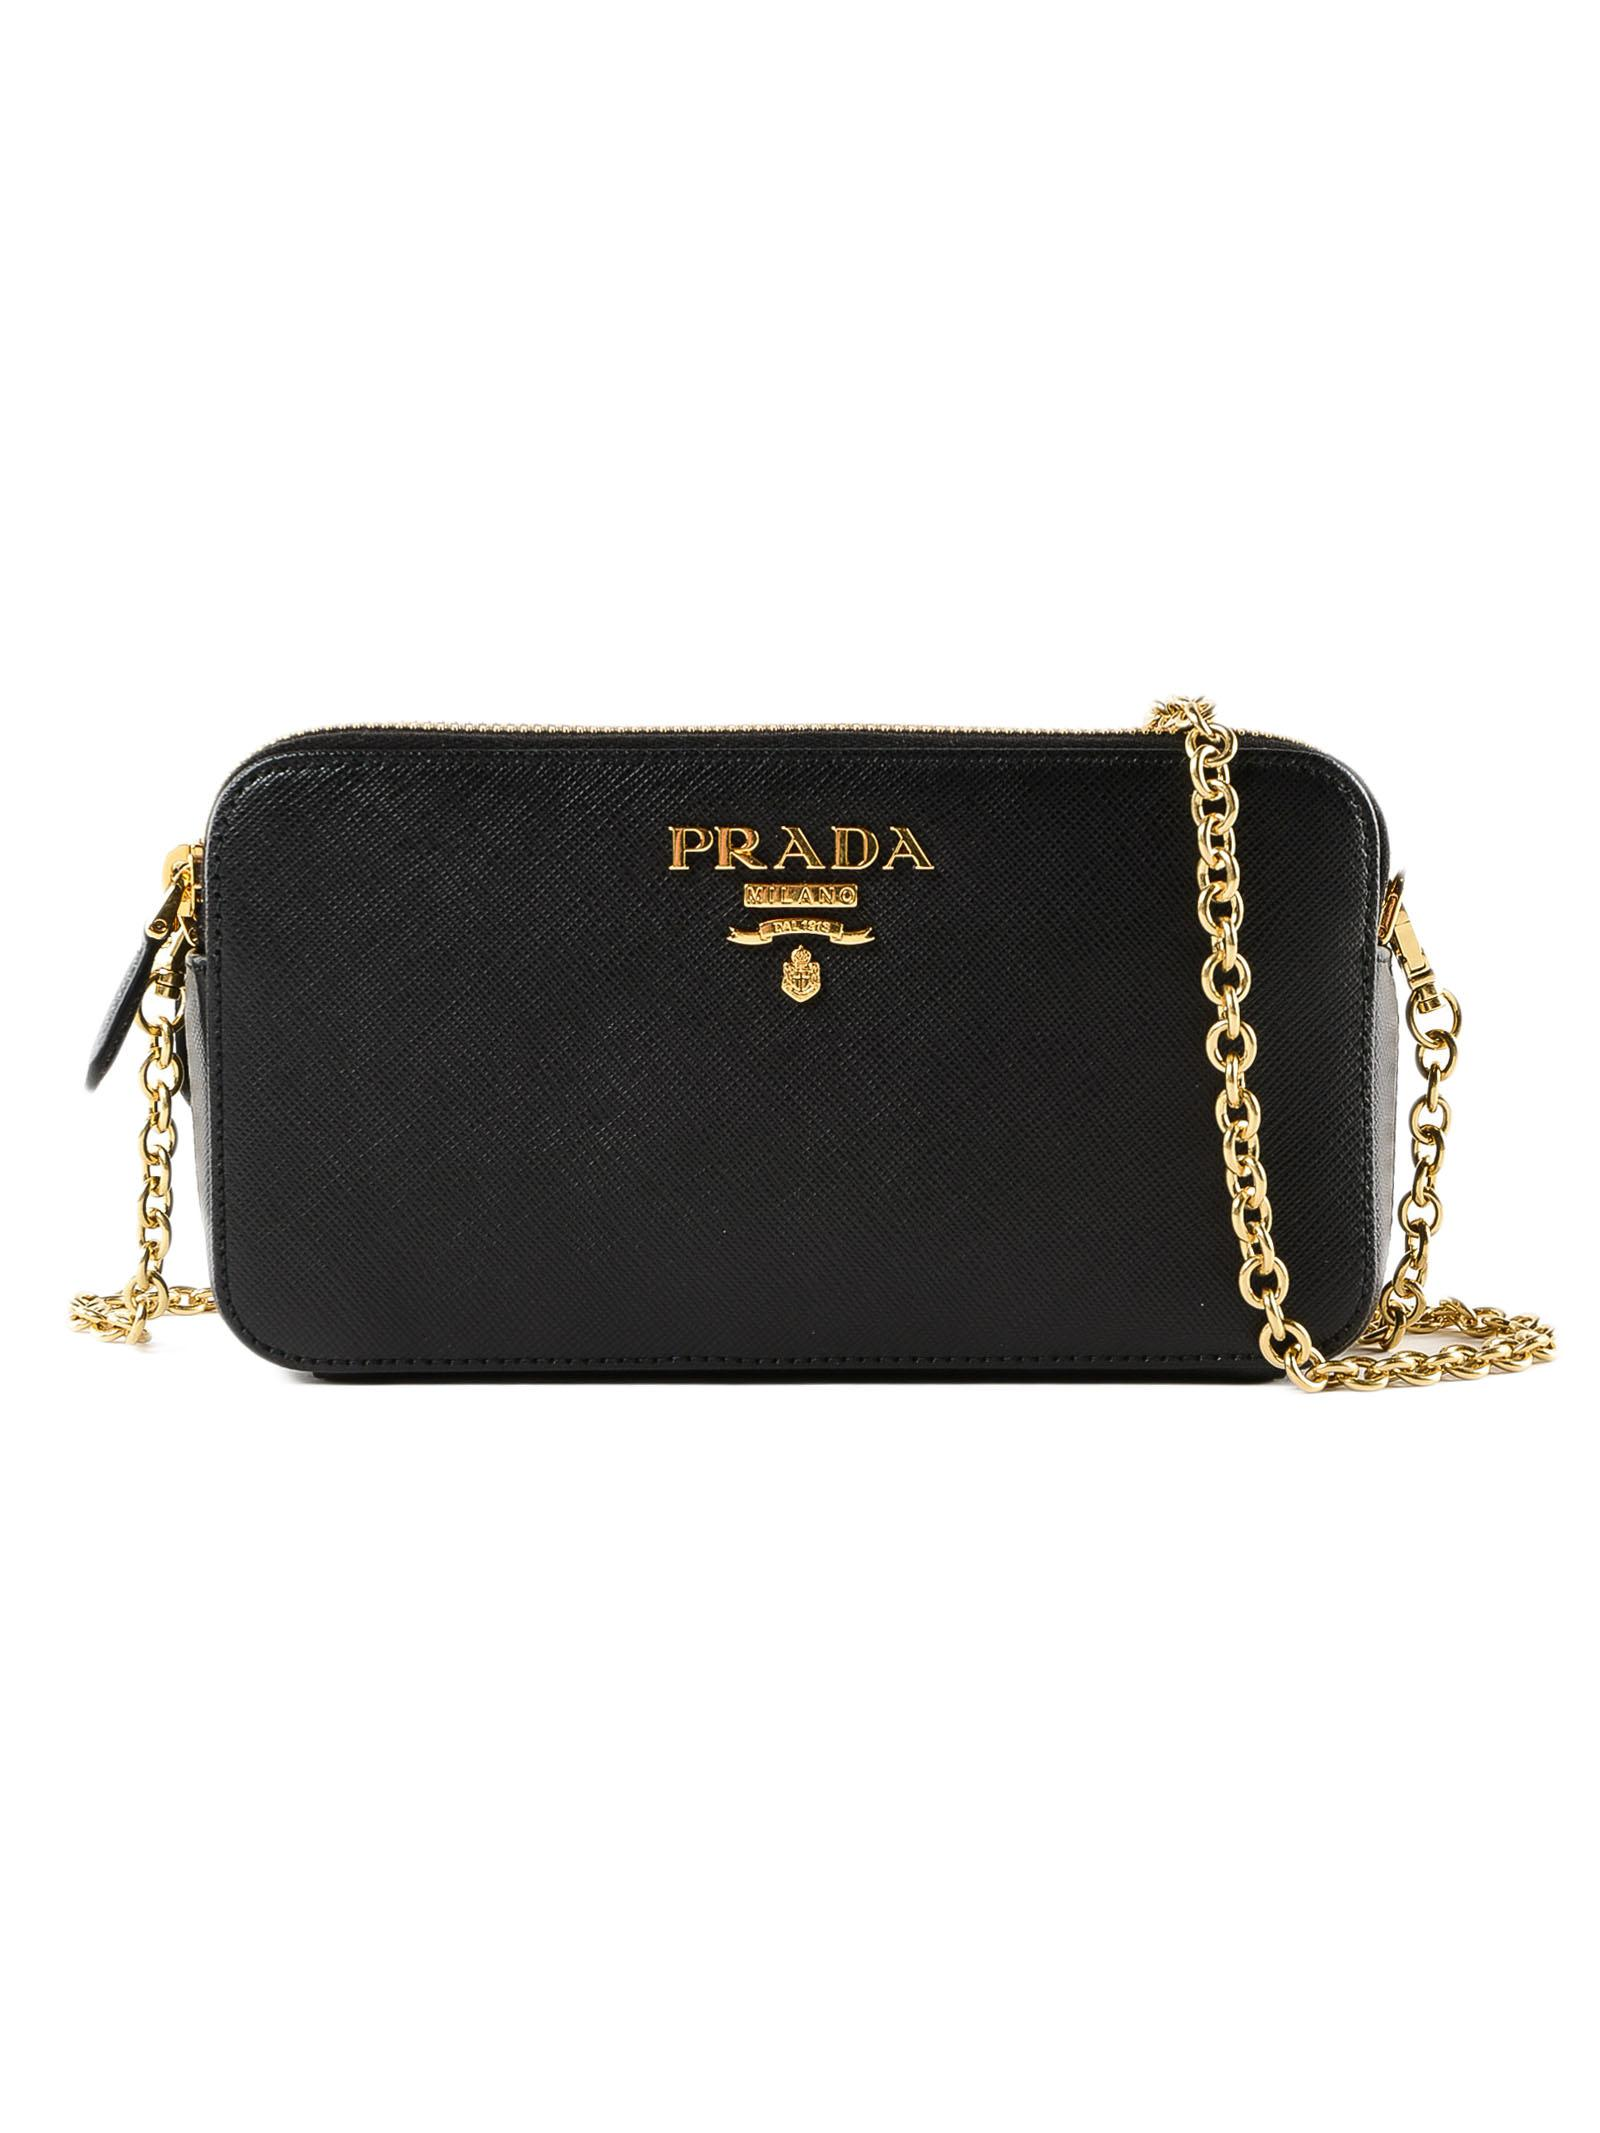 9601e2abe2ae Prada - Black Mini Bag Saffiano - Lyst. View fullscreen